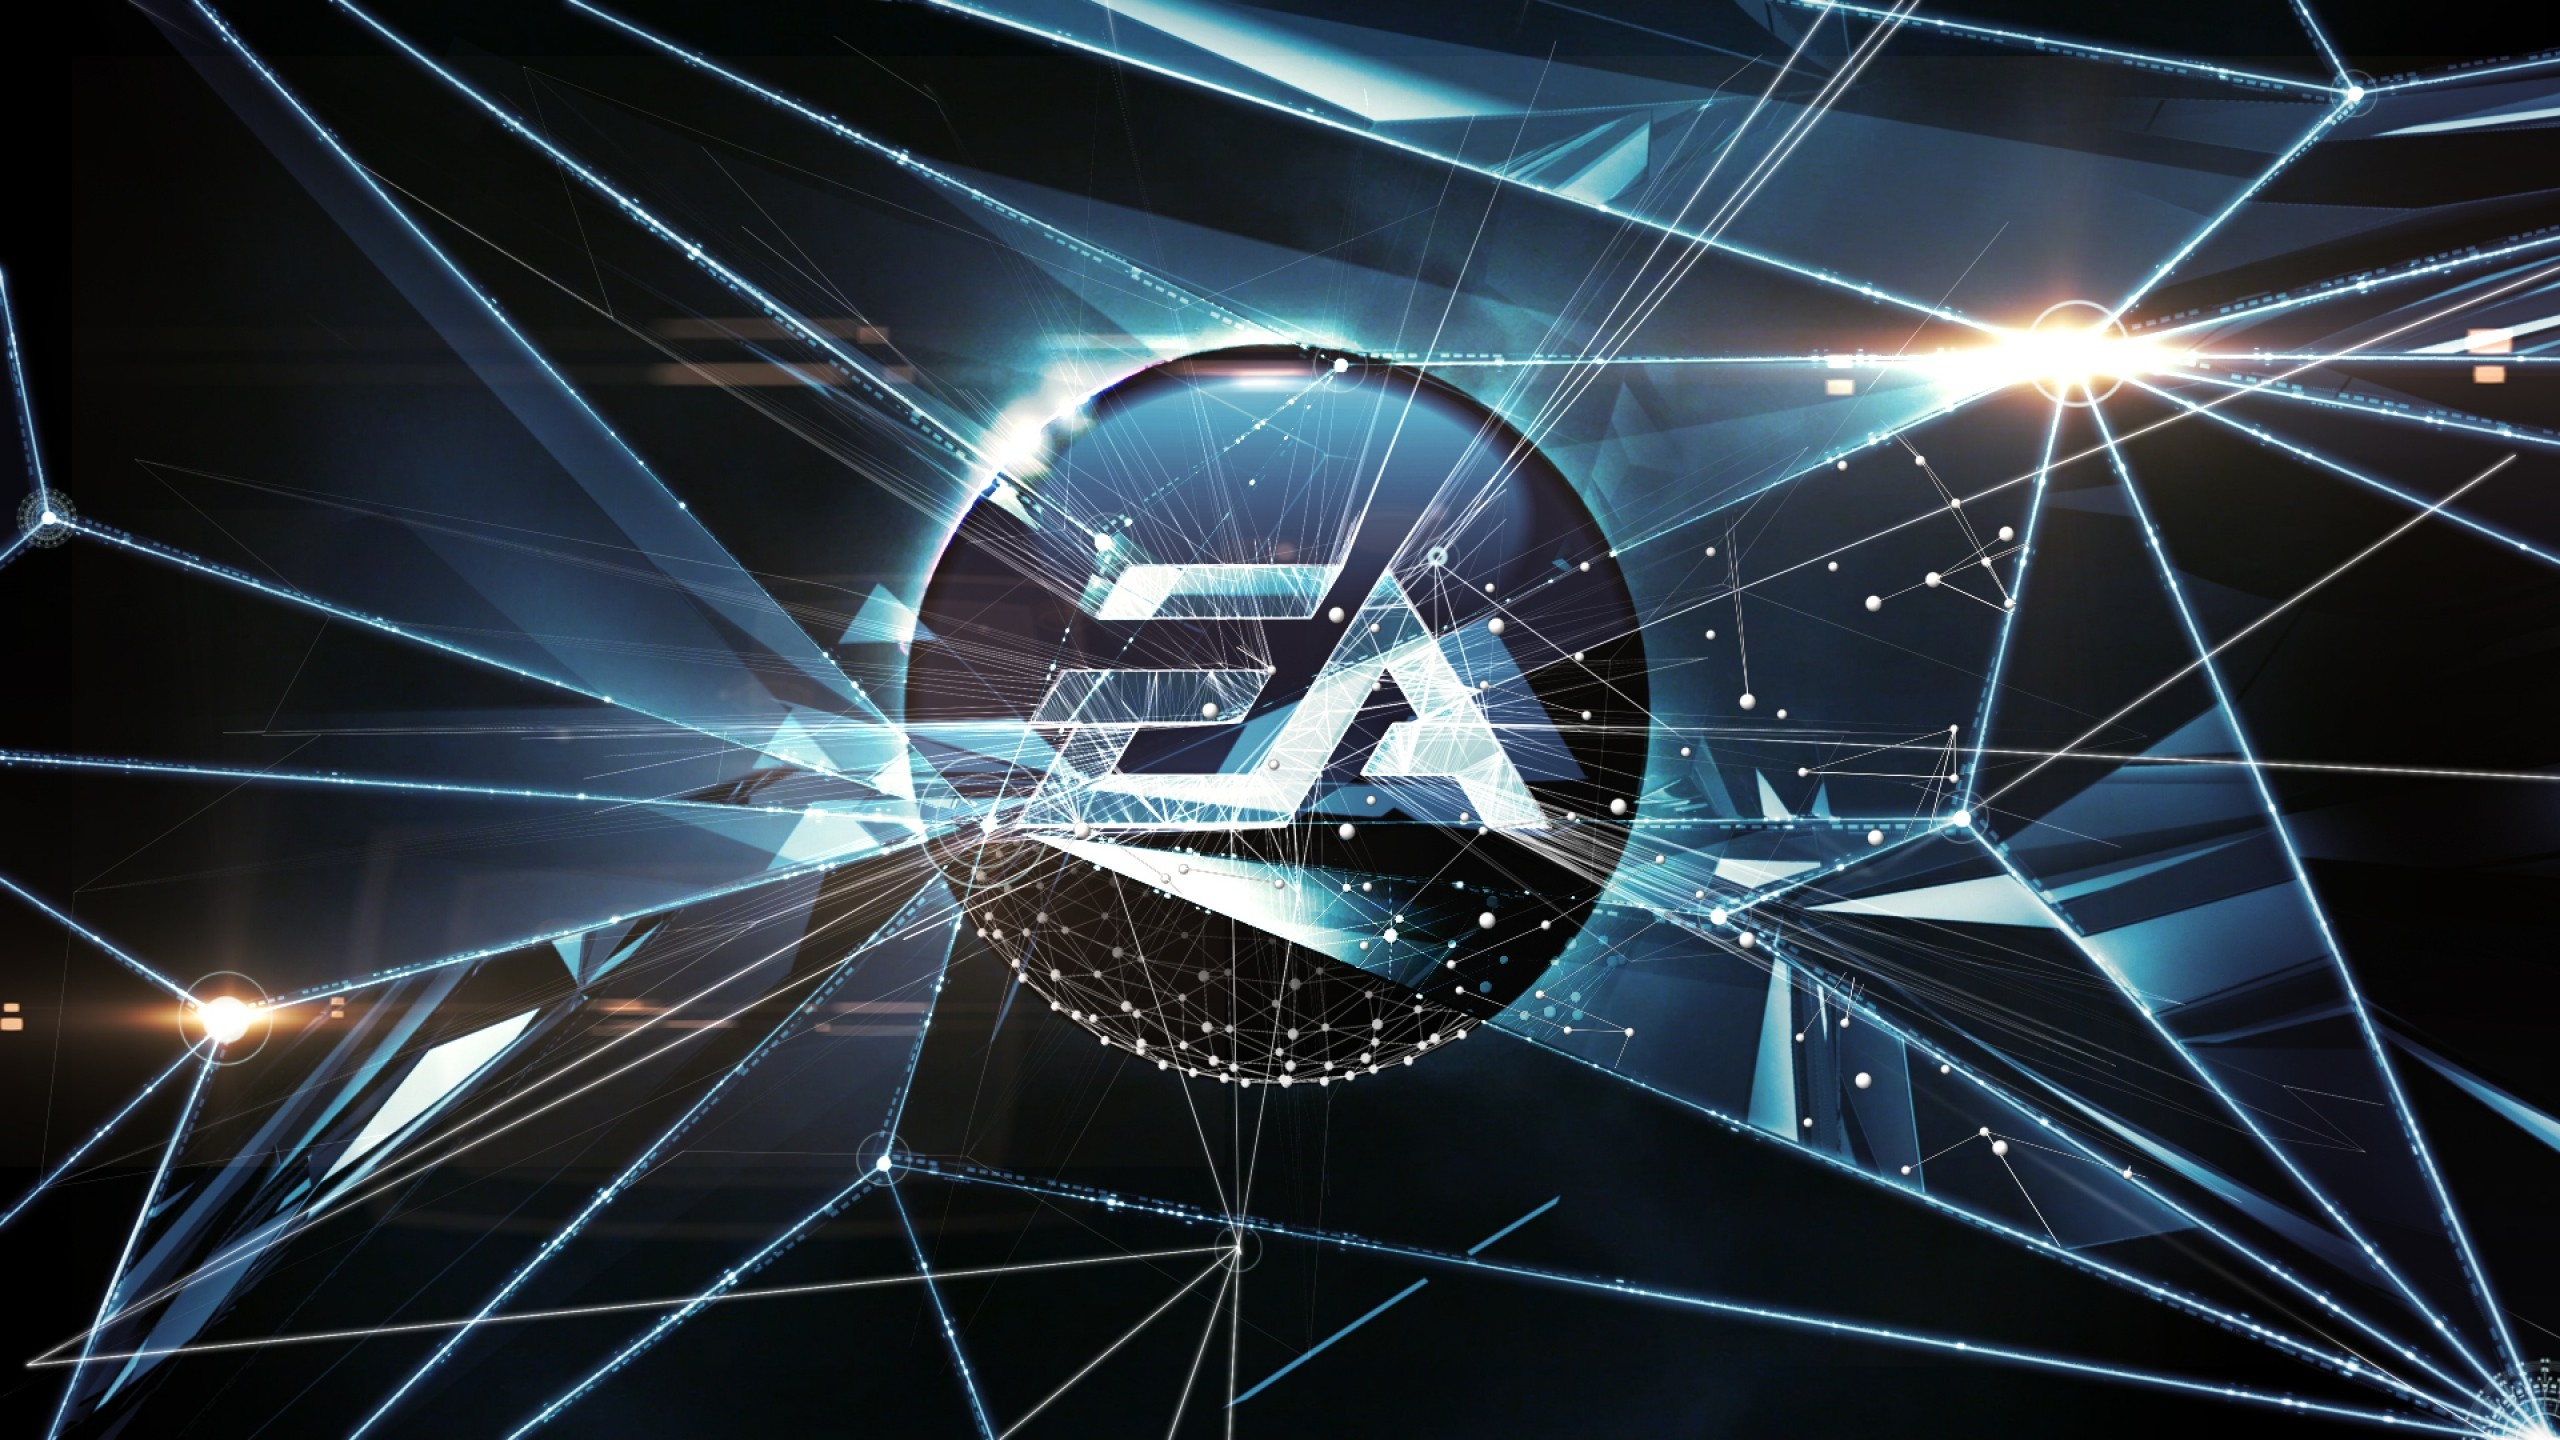 Wallpaper electronic arts, art, corporation, logo, video games